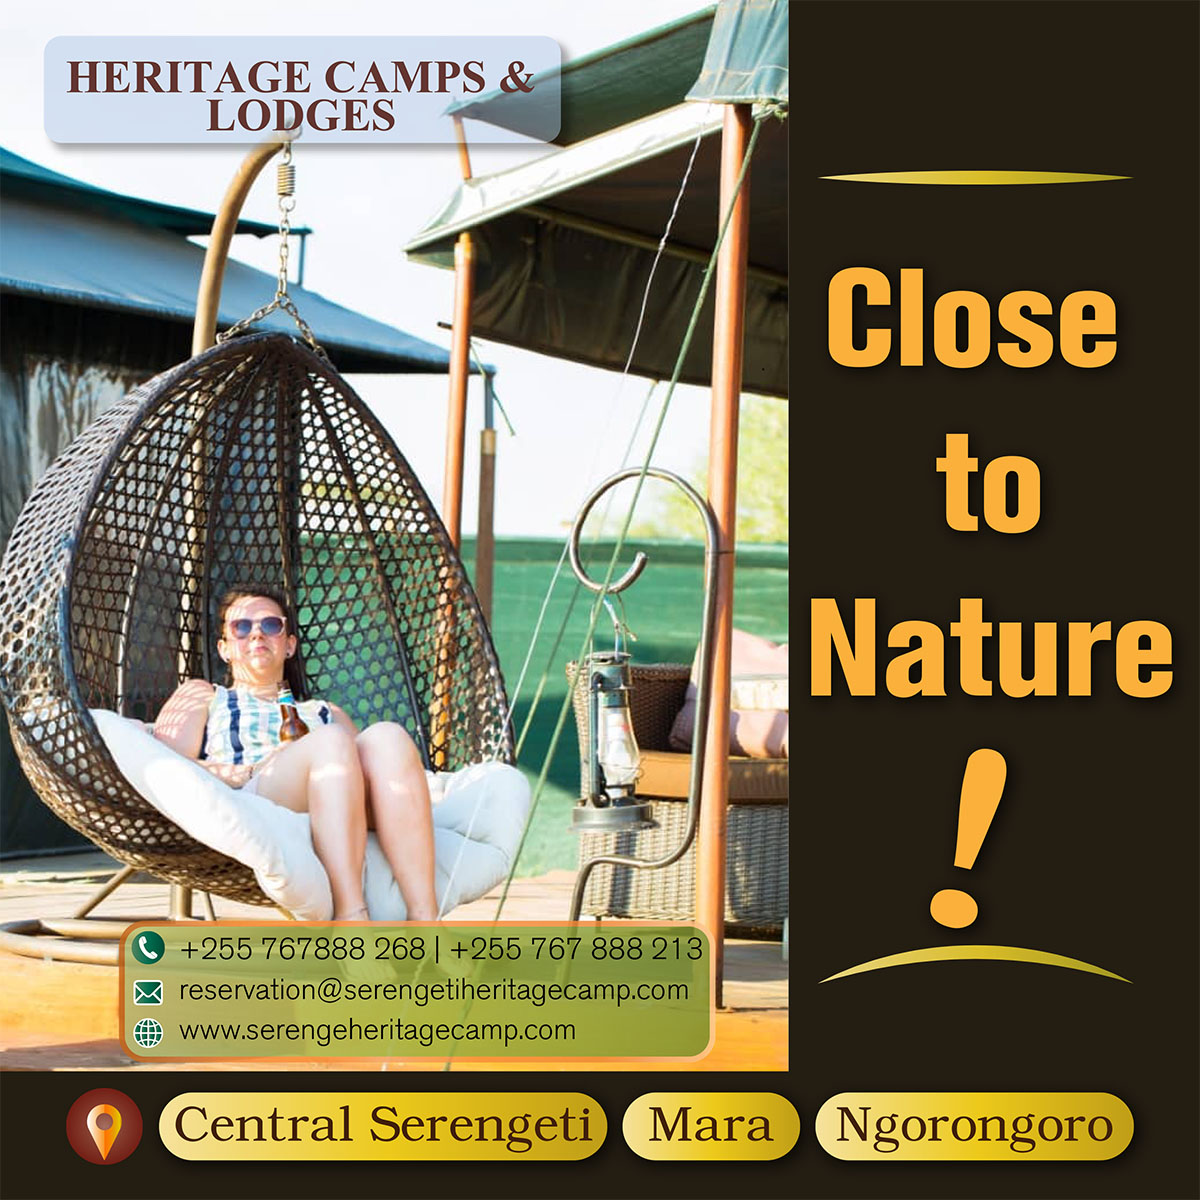 Serengeti Heritage Camps & Lodges Advertisement